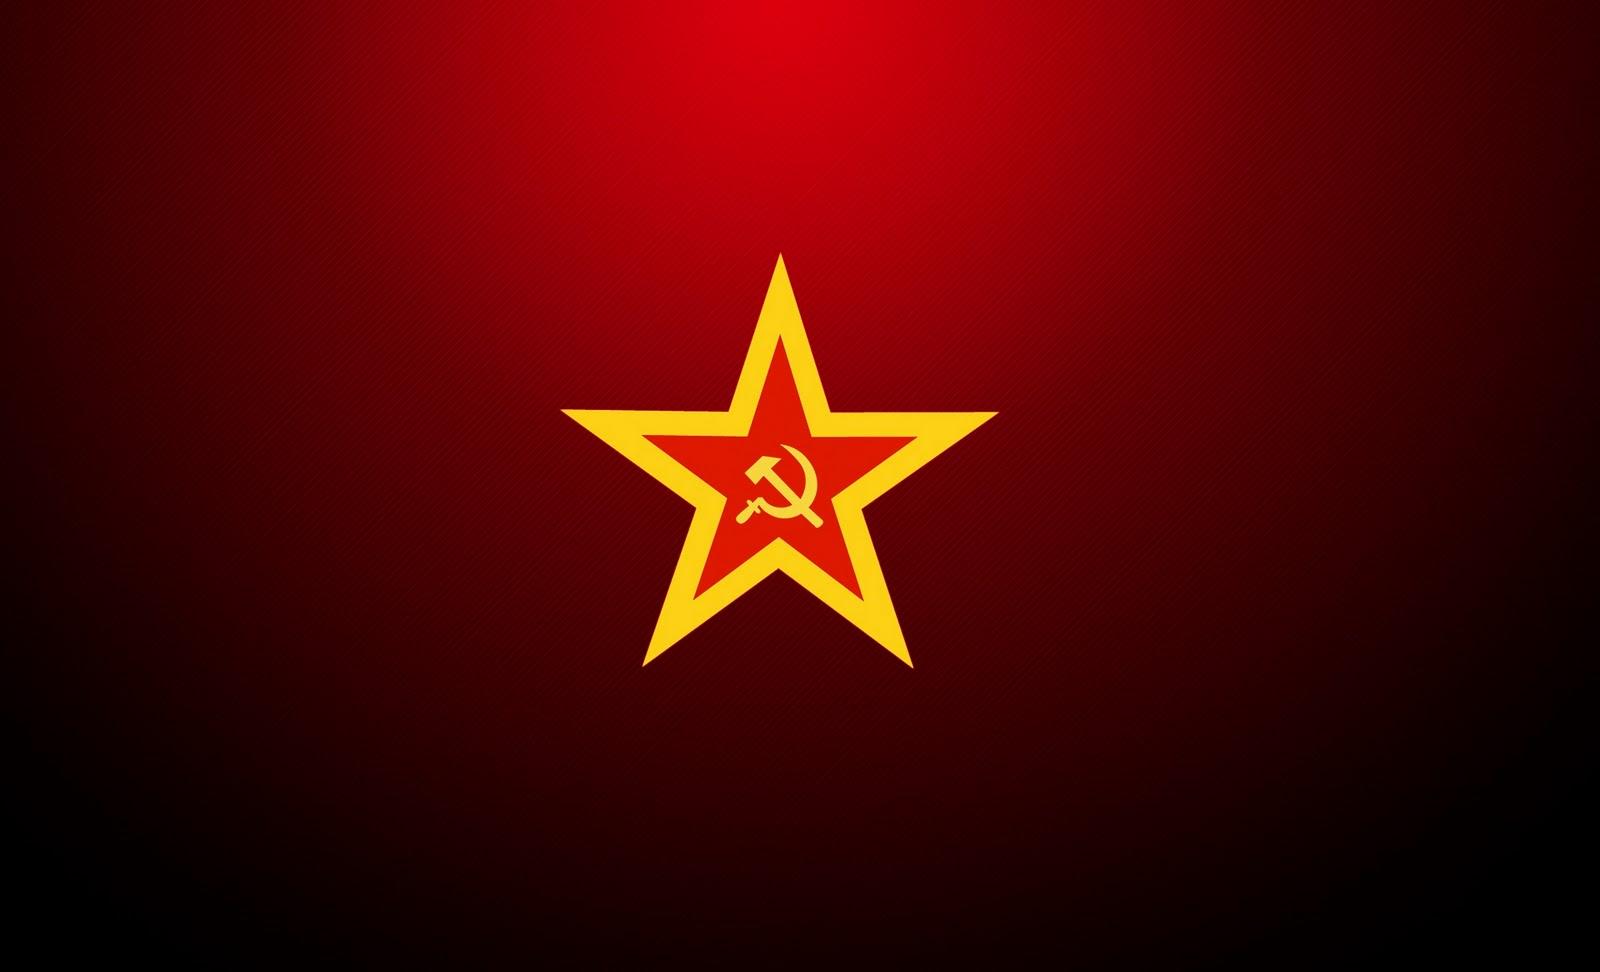 Be_Red_Russia_HD.jpg